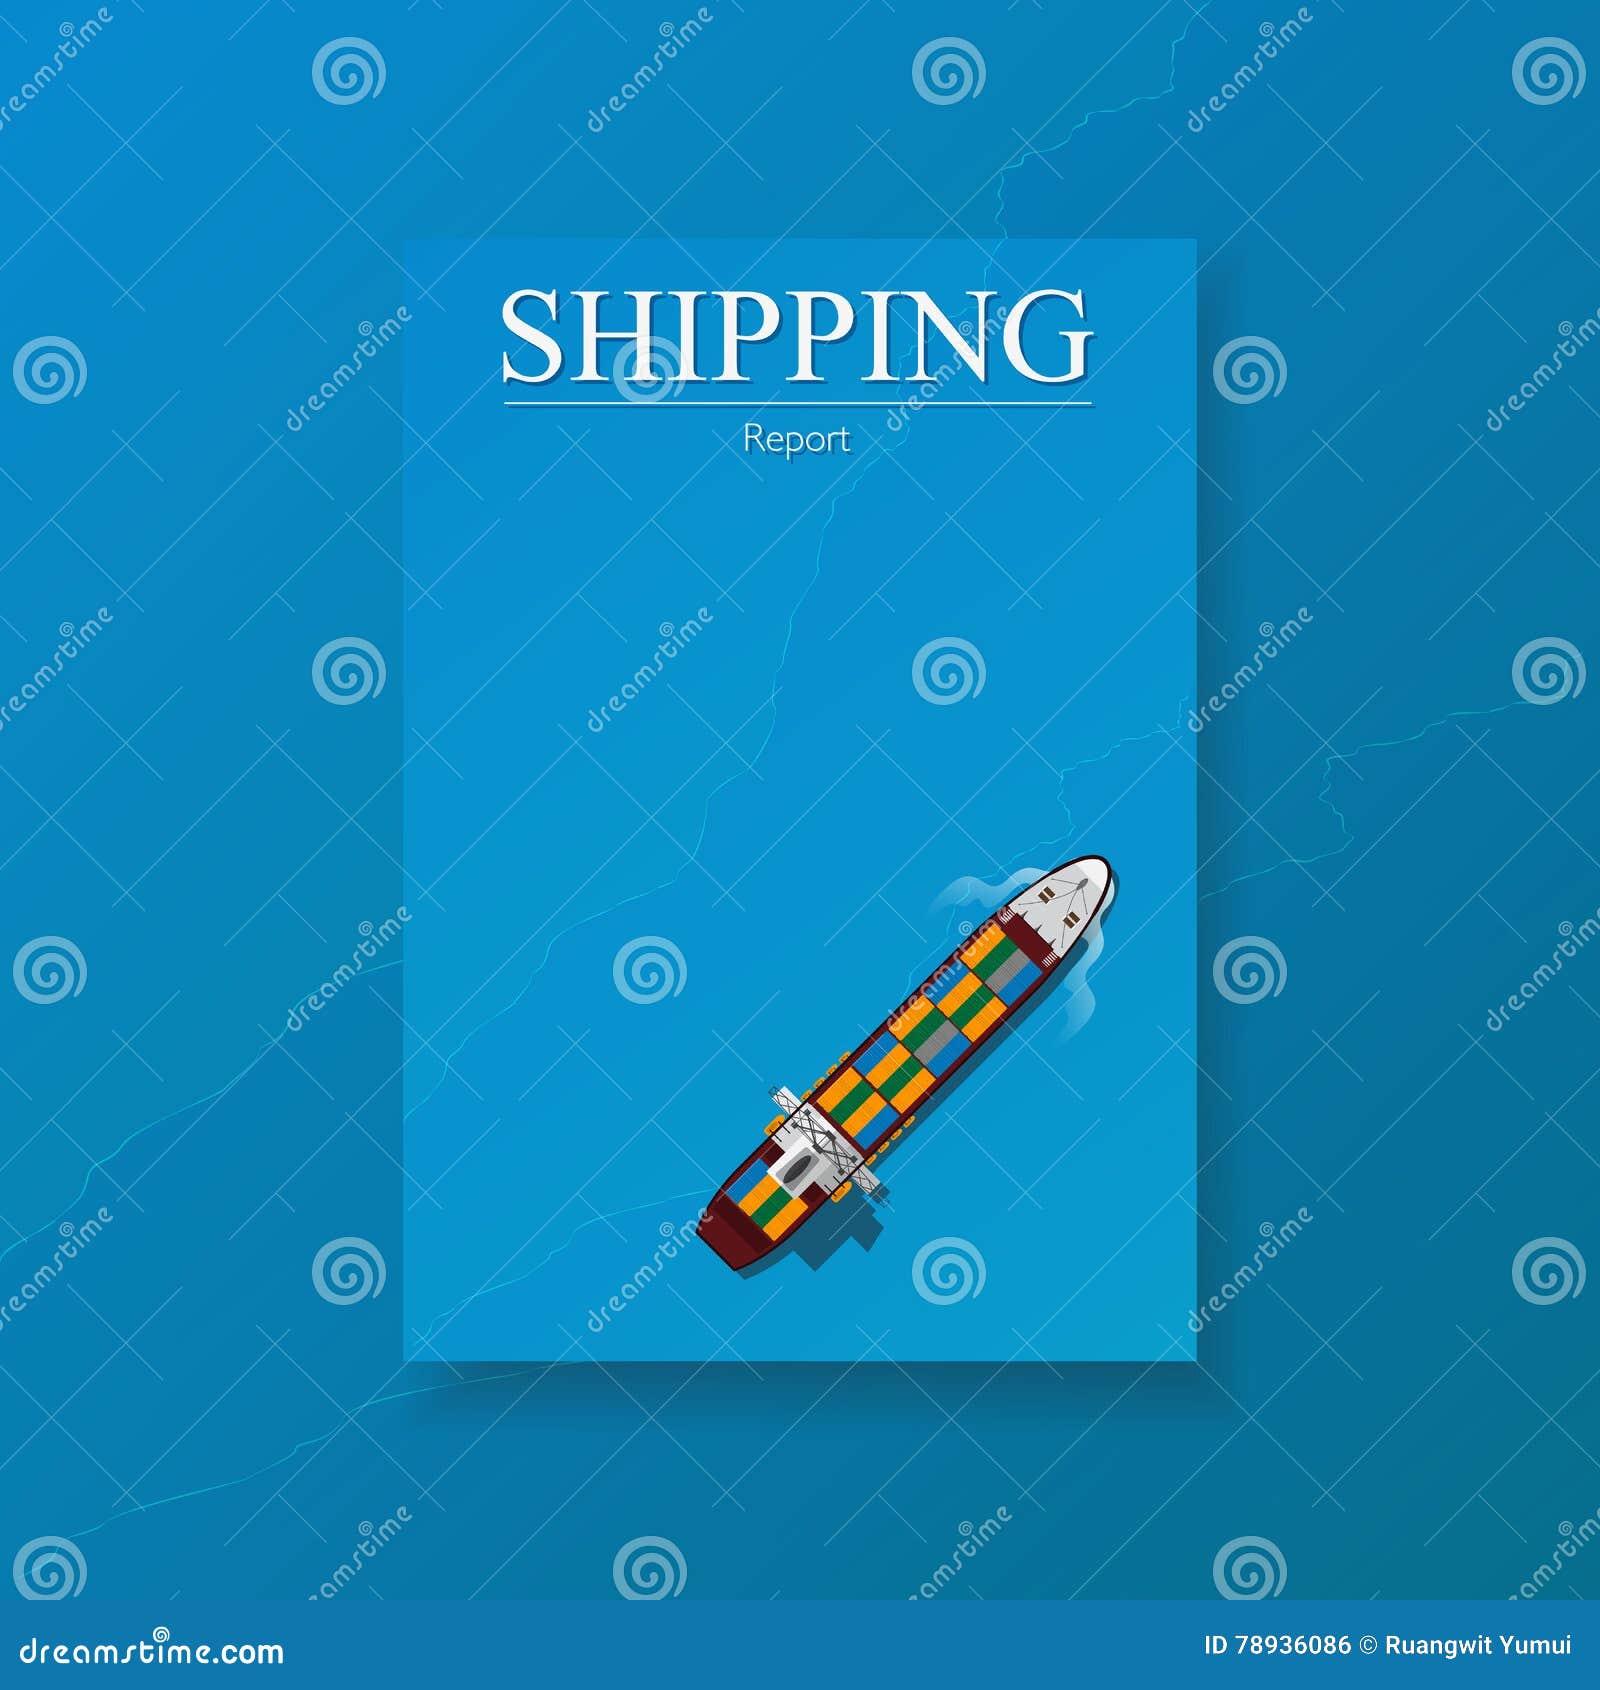 logistic transport business templates for flyers brochure logistic transport business templates for flyers brochure shipping industry annual report folder vector royalty